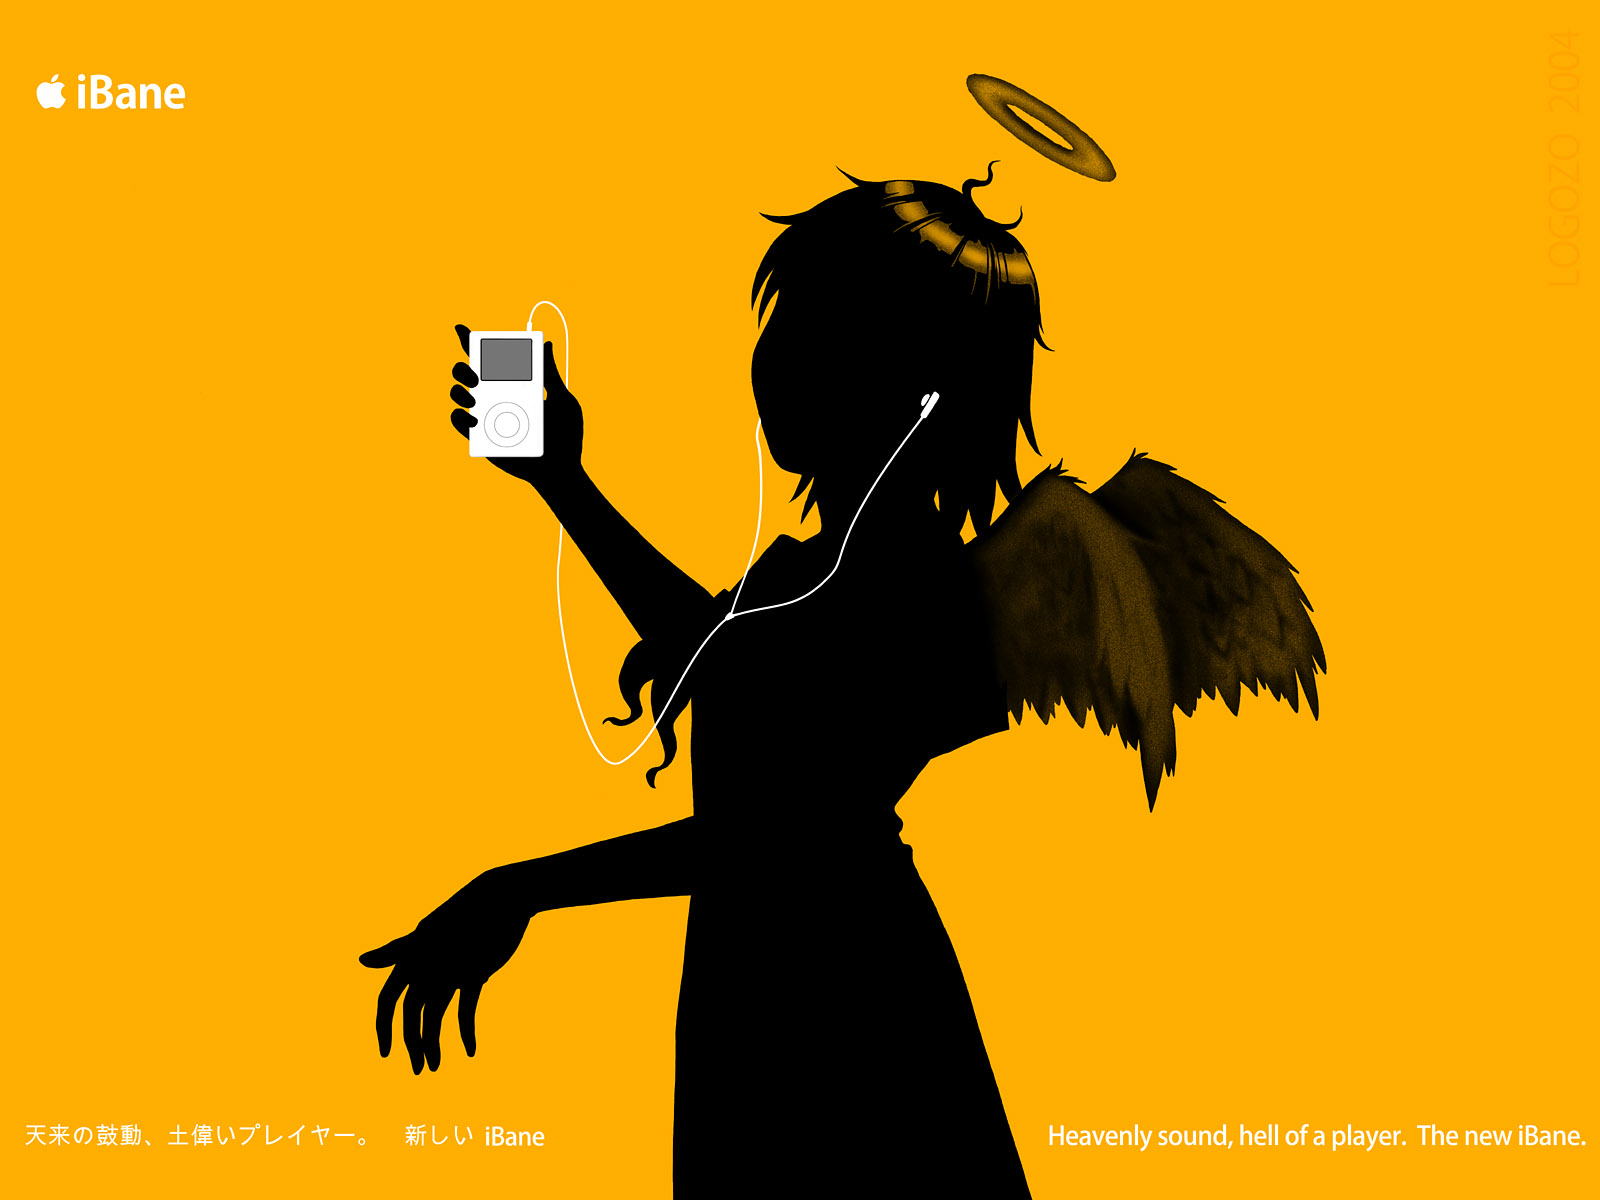 haibane_renmei ipod parody rakka silhouette yellow